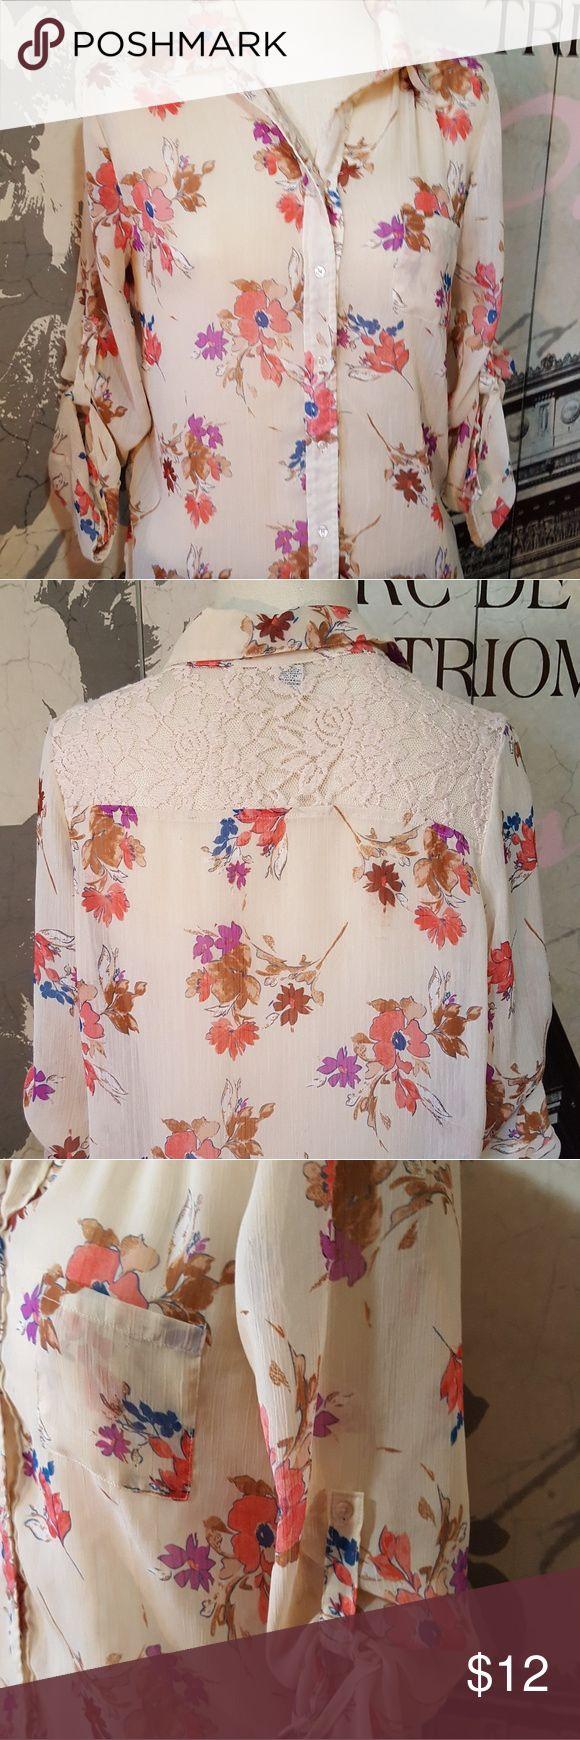 American Rag floral blouse Sheer, lightweight floral blouse.  American Rag brand.  Good shape, no stains or holes. American Rag Tops Blouses